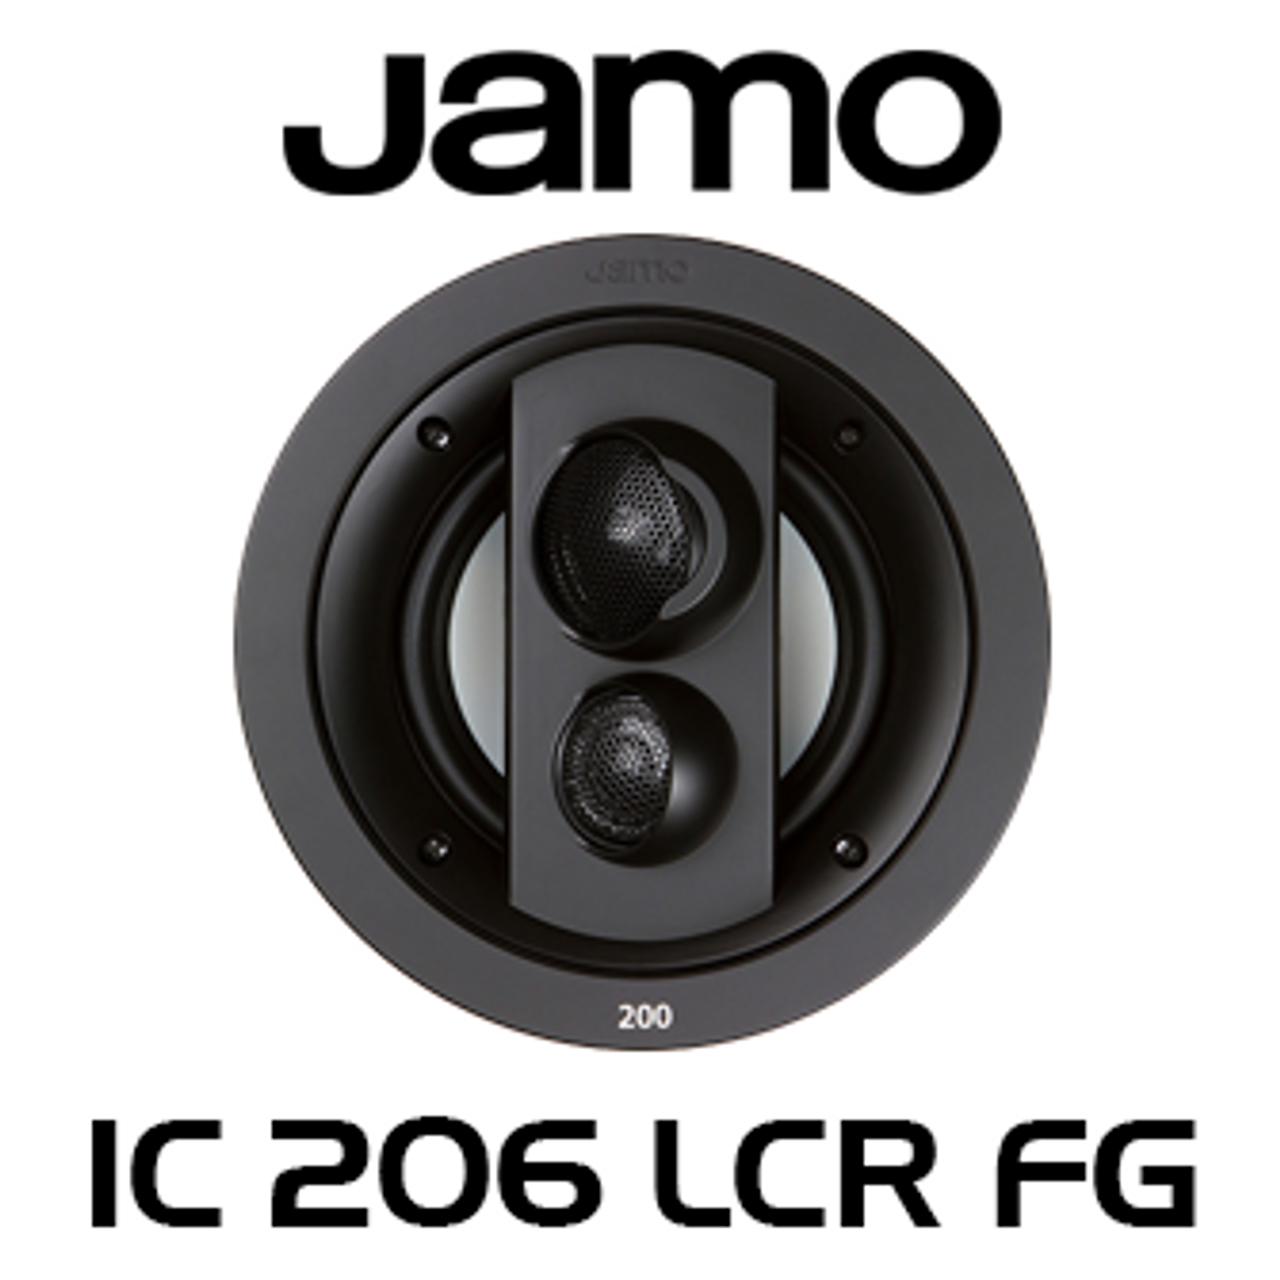 Jamo Ic206 Lcr Fg 6 5 Img 3 Way In Ceiling Speaker Each